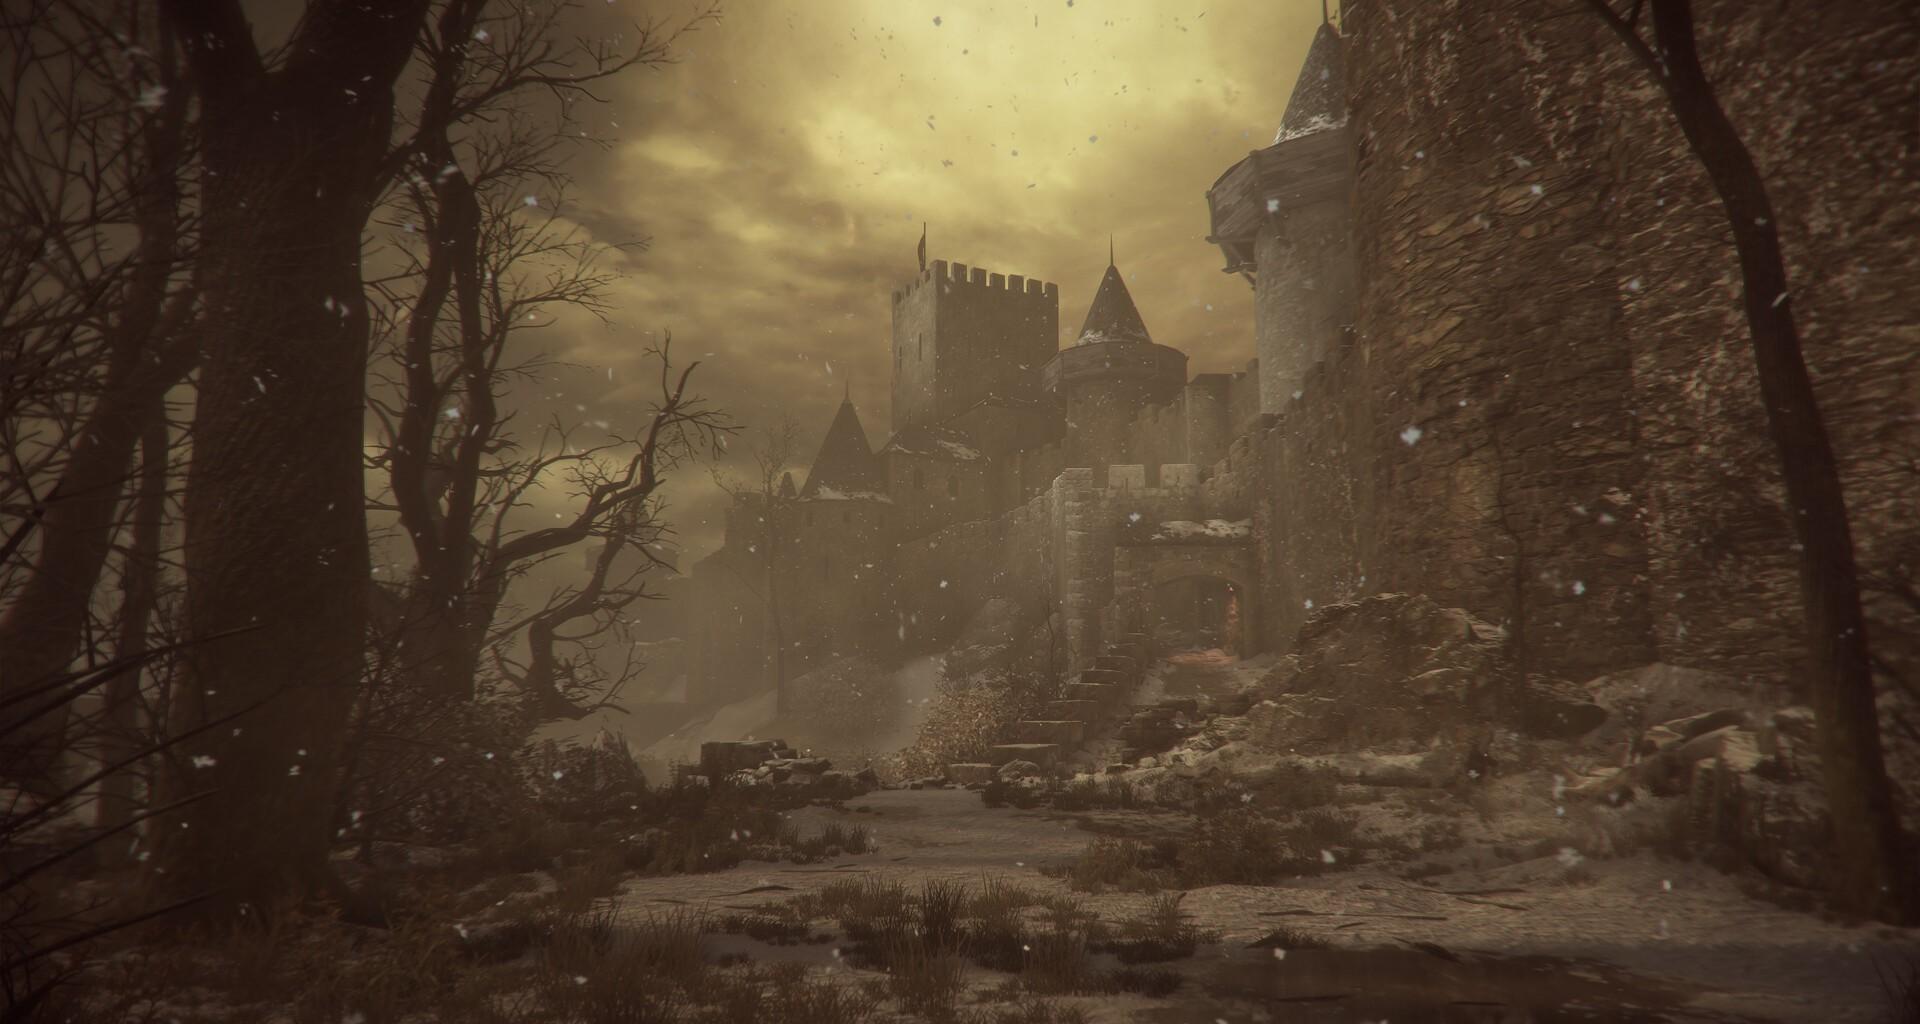 © Cedric Rousseau, A Plague Tale: Innocence, Asobo Studio, Focus Home Interactive